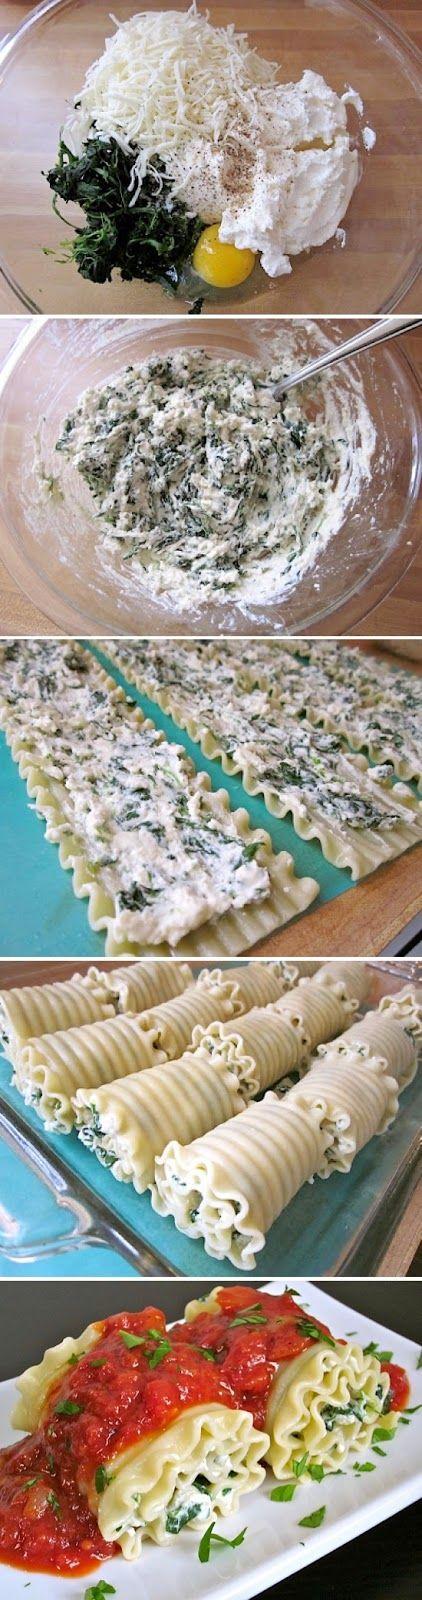 Lasagna Rolls - the photo recipe